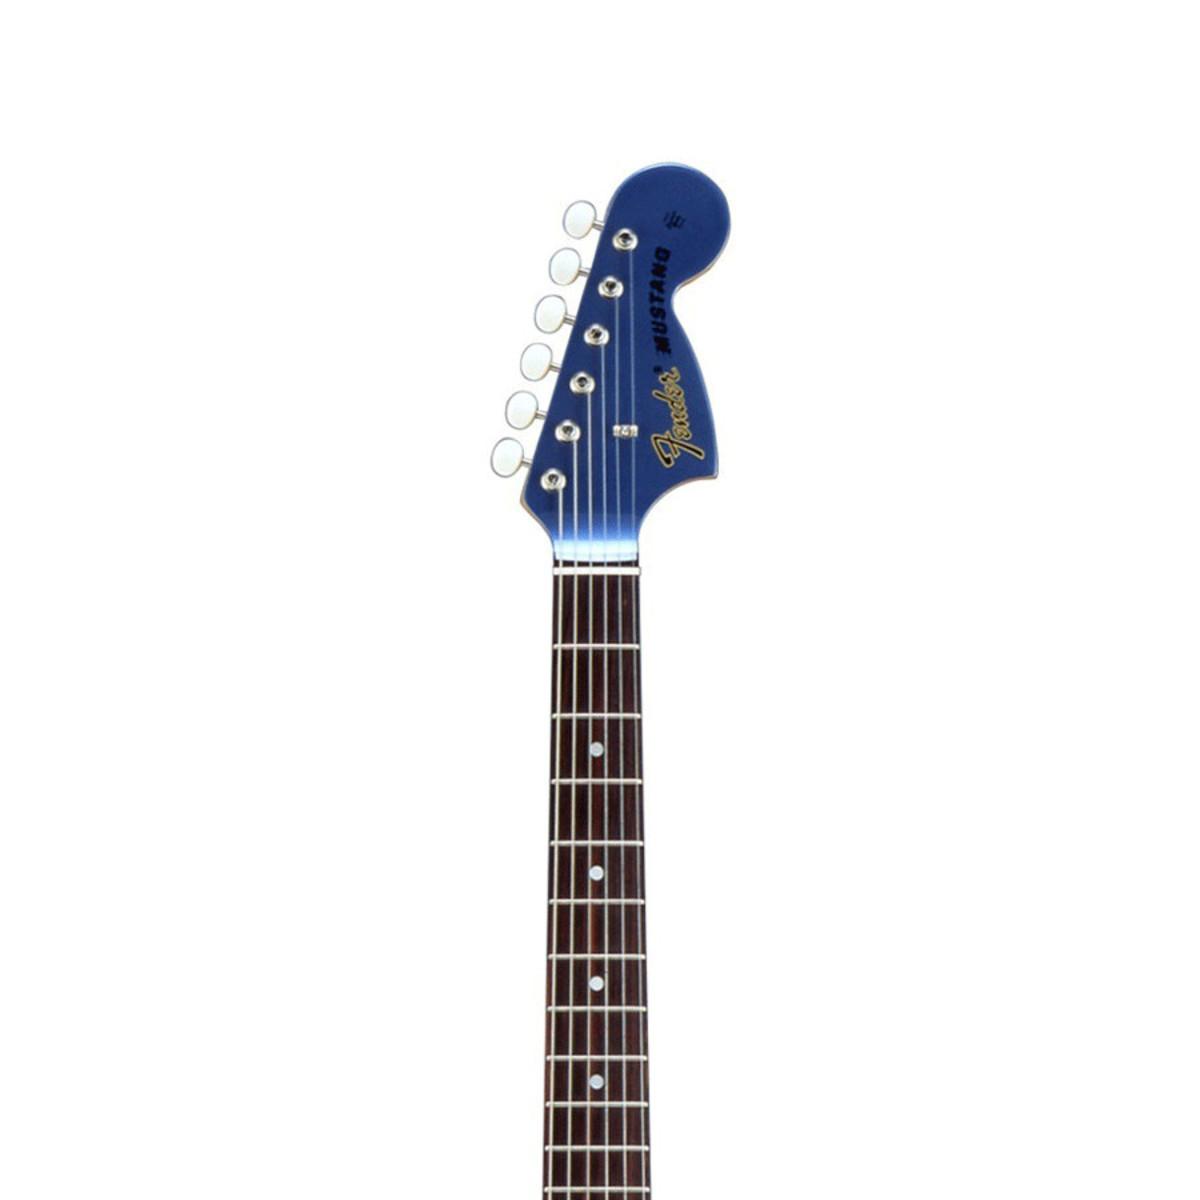 fender fsr competition mustang electric guitar lake placid blue at gear4music. Black Bedroom Furniture Sets. Home Design Ideas